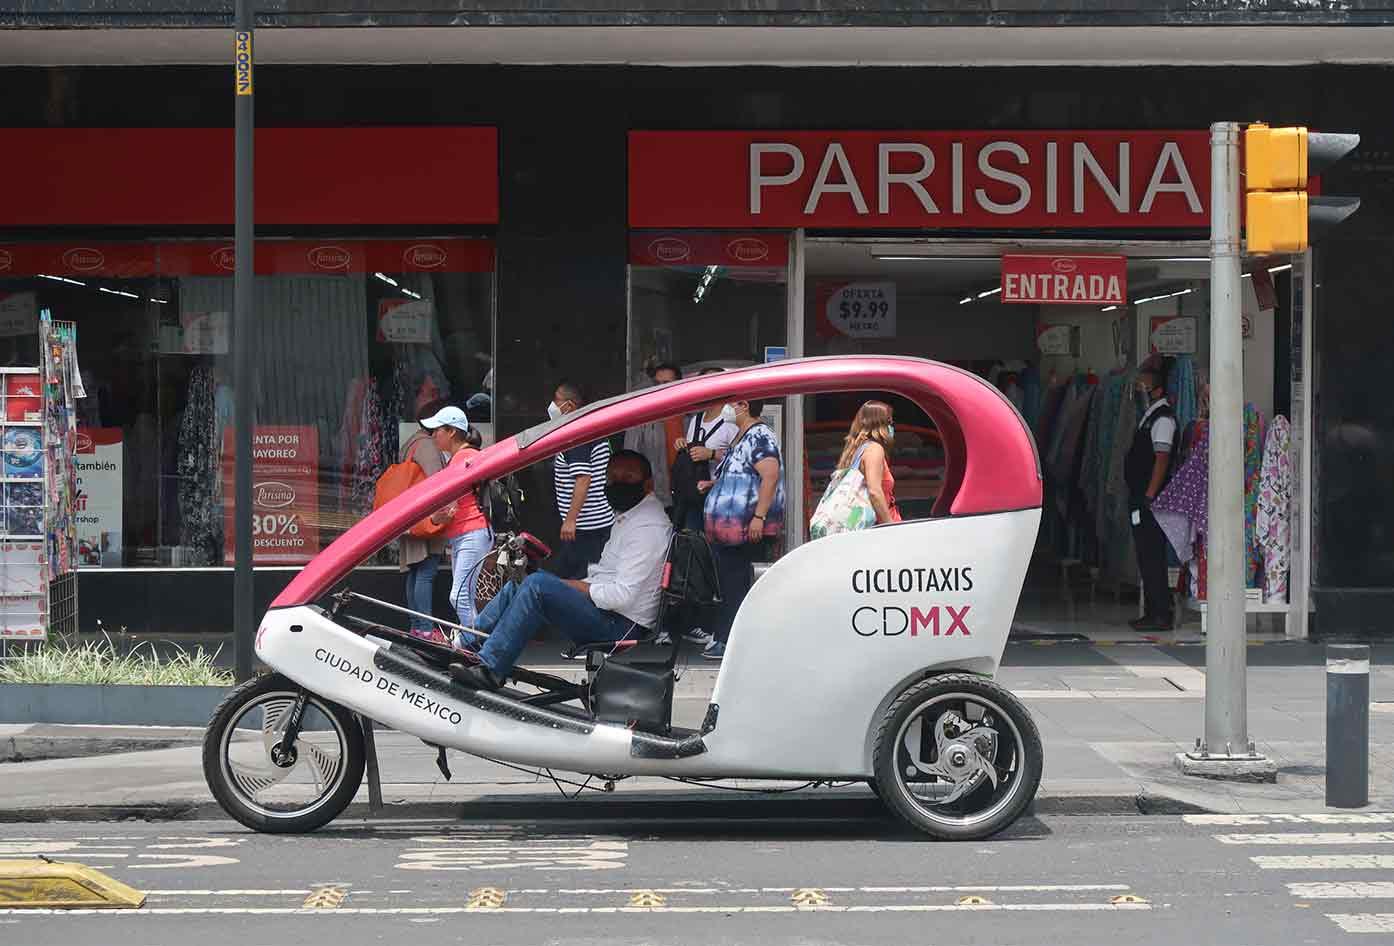 ciclo taxi mexico city